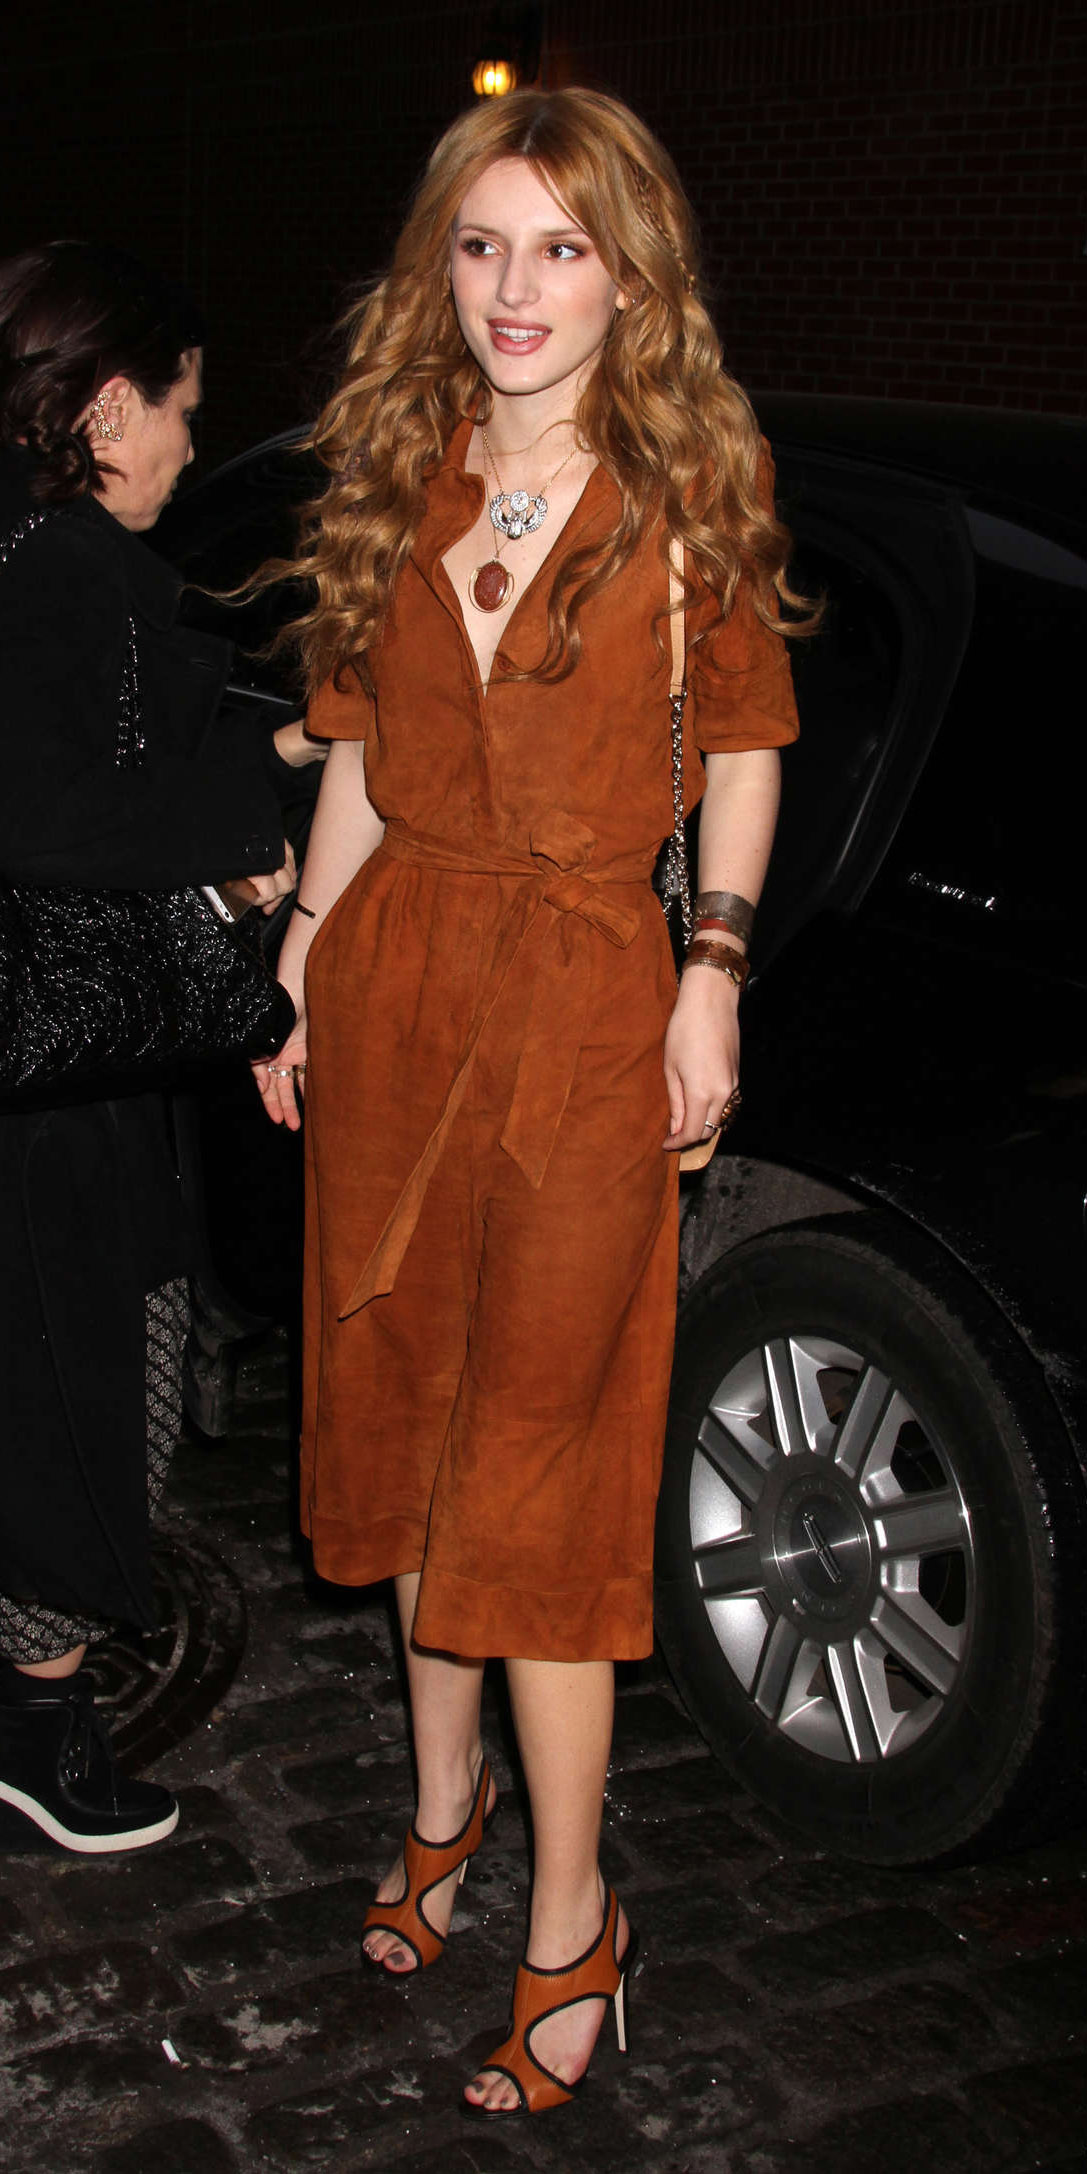 o-camel-jumpsuit-cognac-shoe-sandalh-hairr-necklace-pend-braceletd-fall-winter-wear-fashion-style-bellathorne-celebrity-dinner.jpg